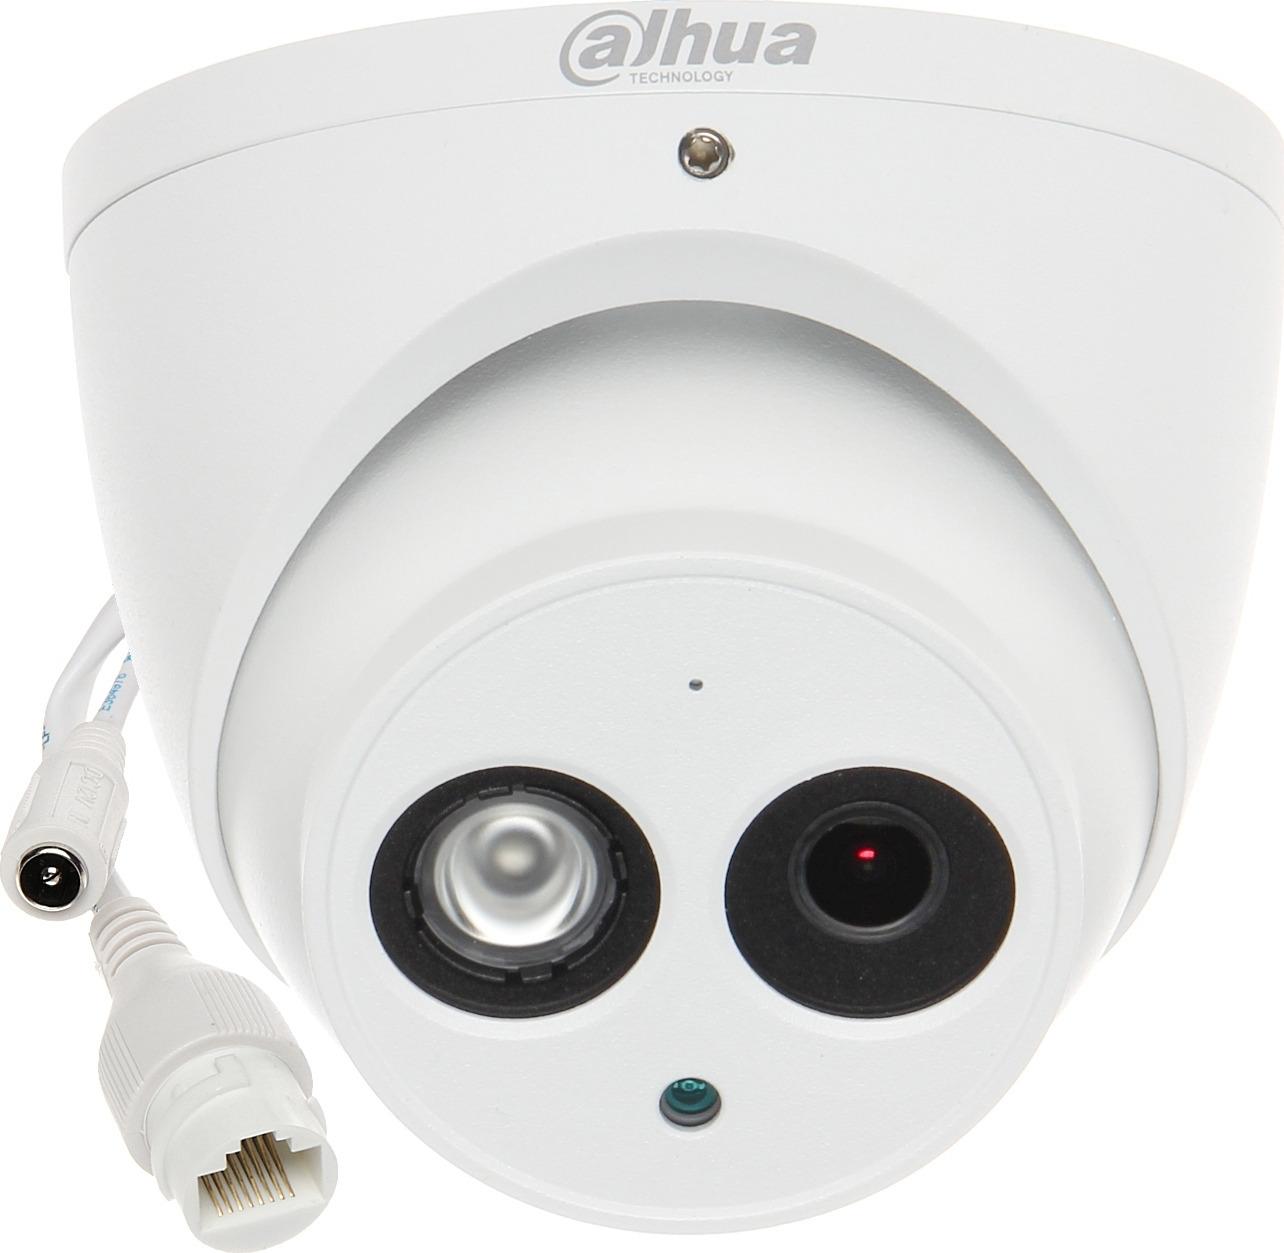 Видеокамера IP Dahua, DH-IPC-HDW4231EMP-ASE-0280B, белый ip камера dahua dh ipc hdw4231emp ase 0280b